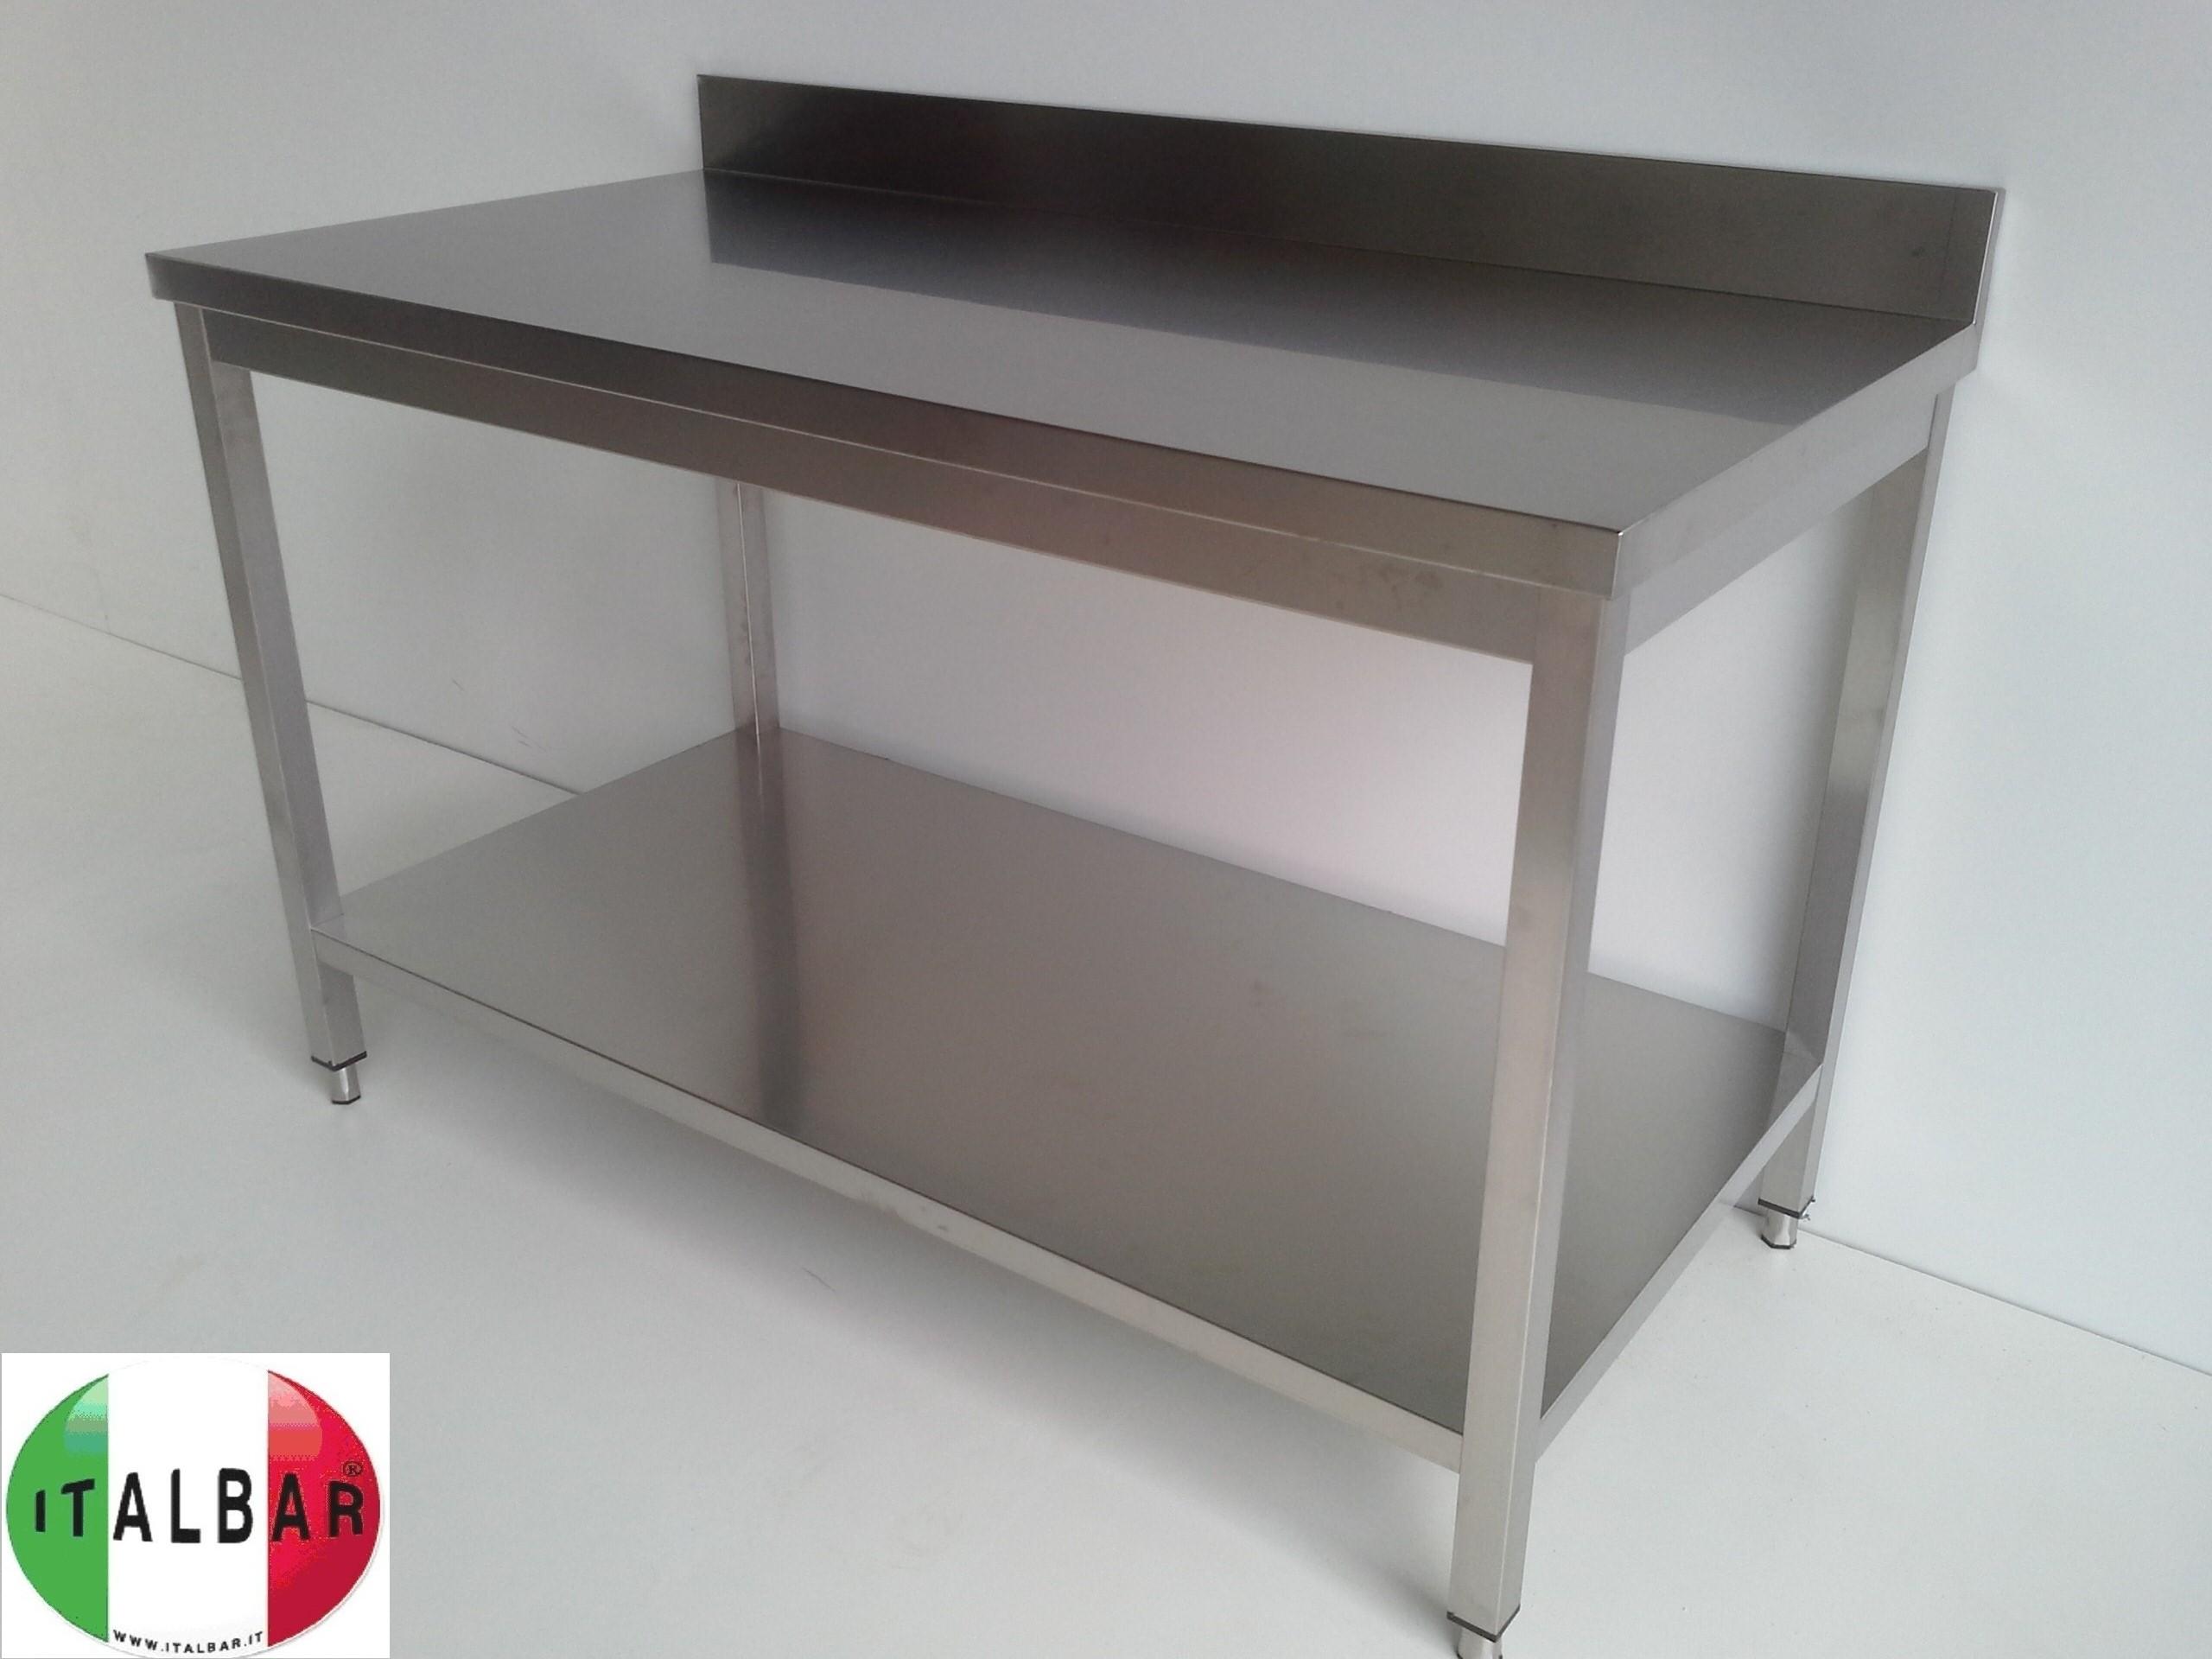 Suarez cica italian pasta tavolo acciaio argento